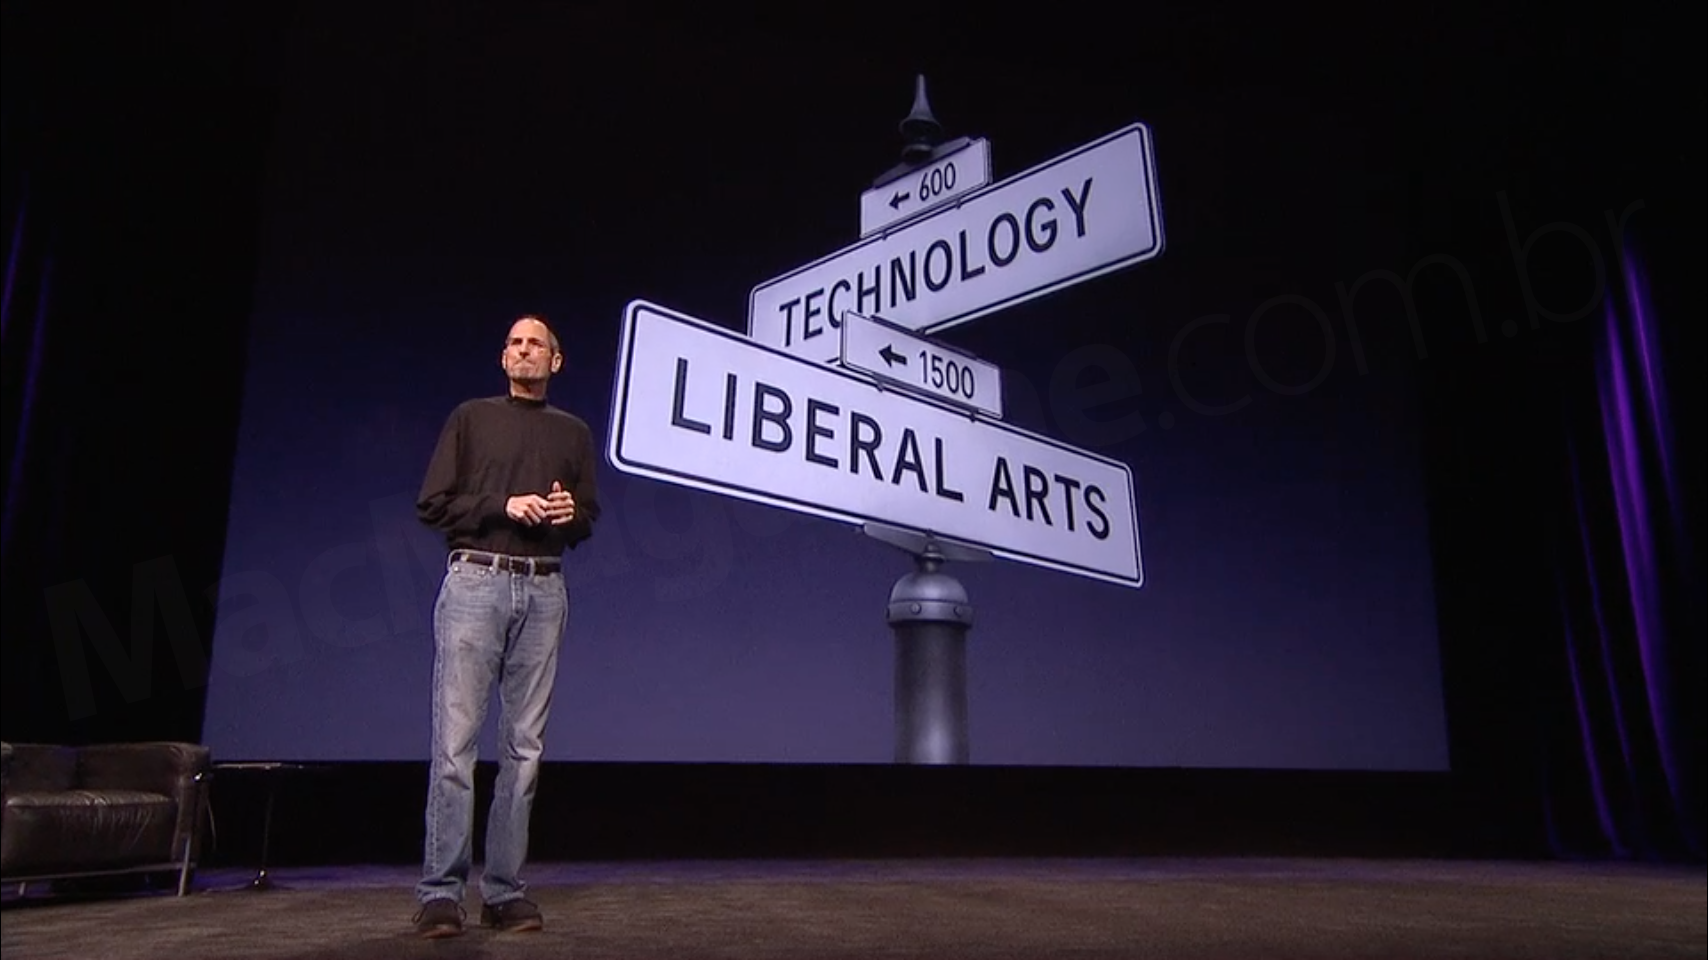 Keynote do iPad 2 (Tecnologia & Humanidade)